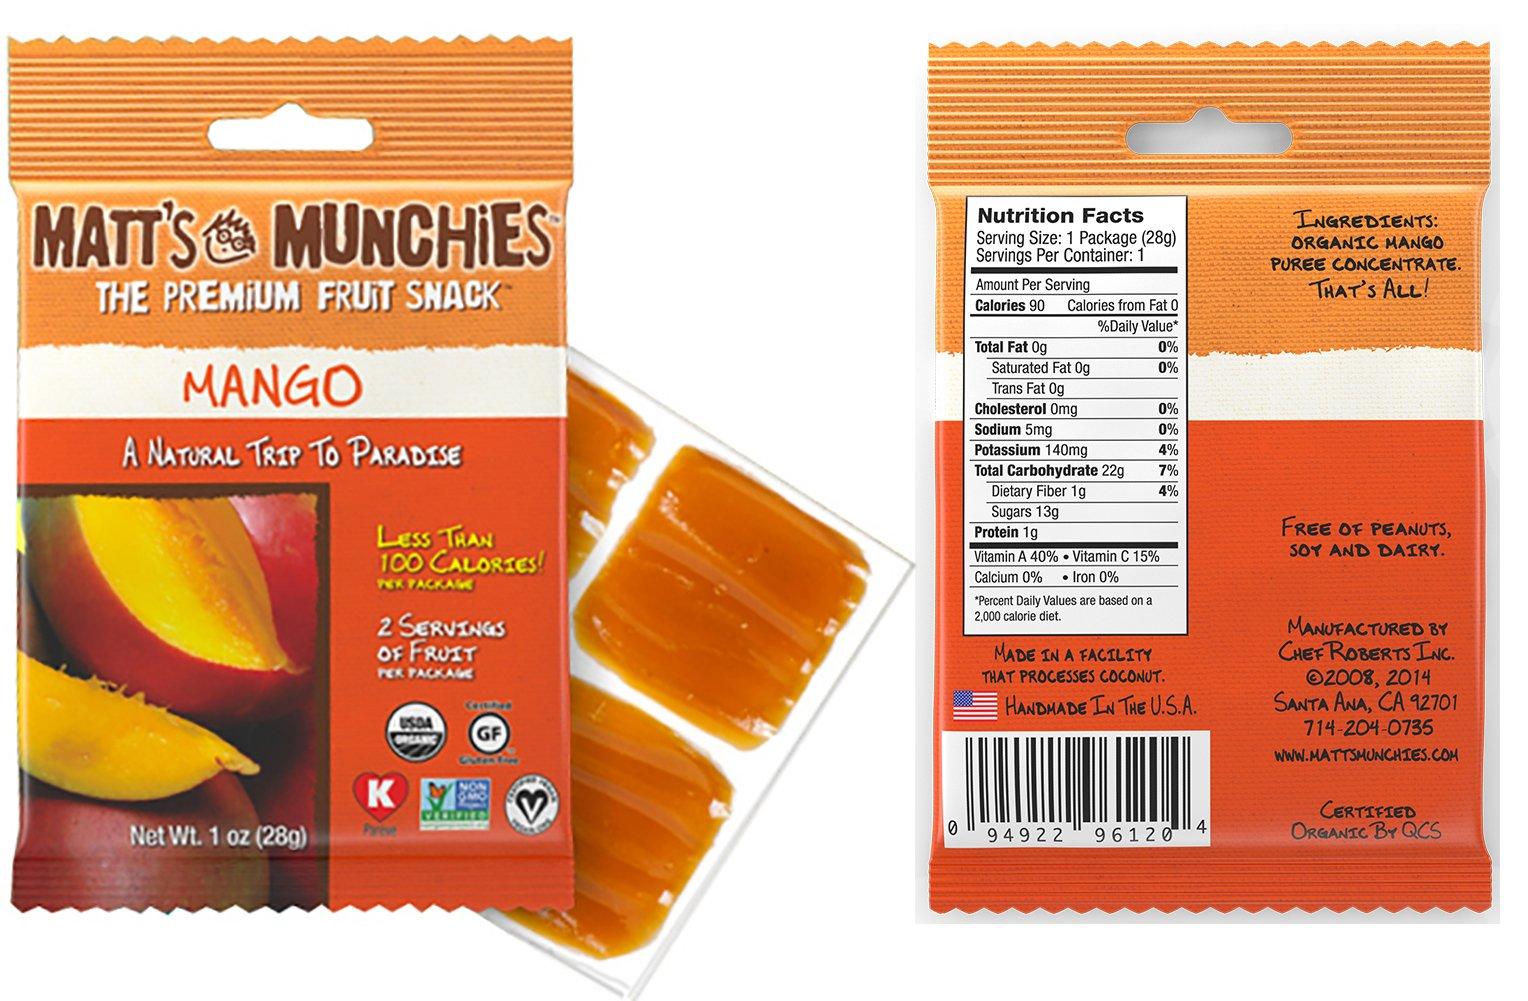 Matt's Munchies Tropical Assortment Organic Non-GMO Fruit Leather Peelable Fruit Snacks 25 Count Variety Pack Caddy - Mango, Island Mango, Tropical Punch, Banana Coconut & Apple by Matt's Munchies (Image #5)